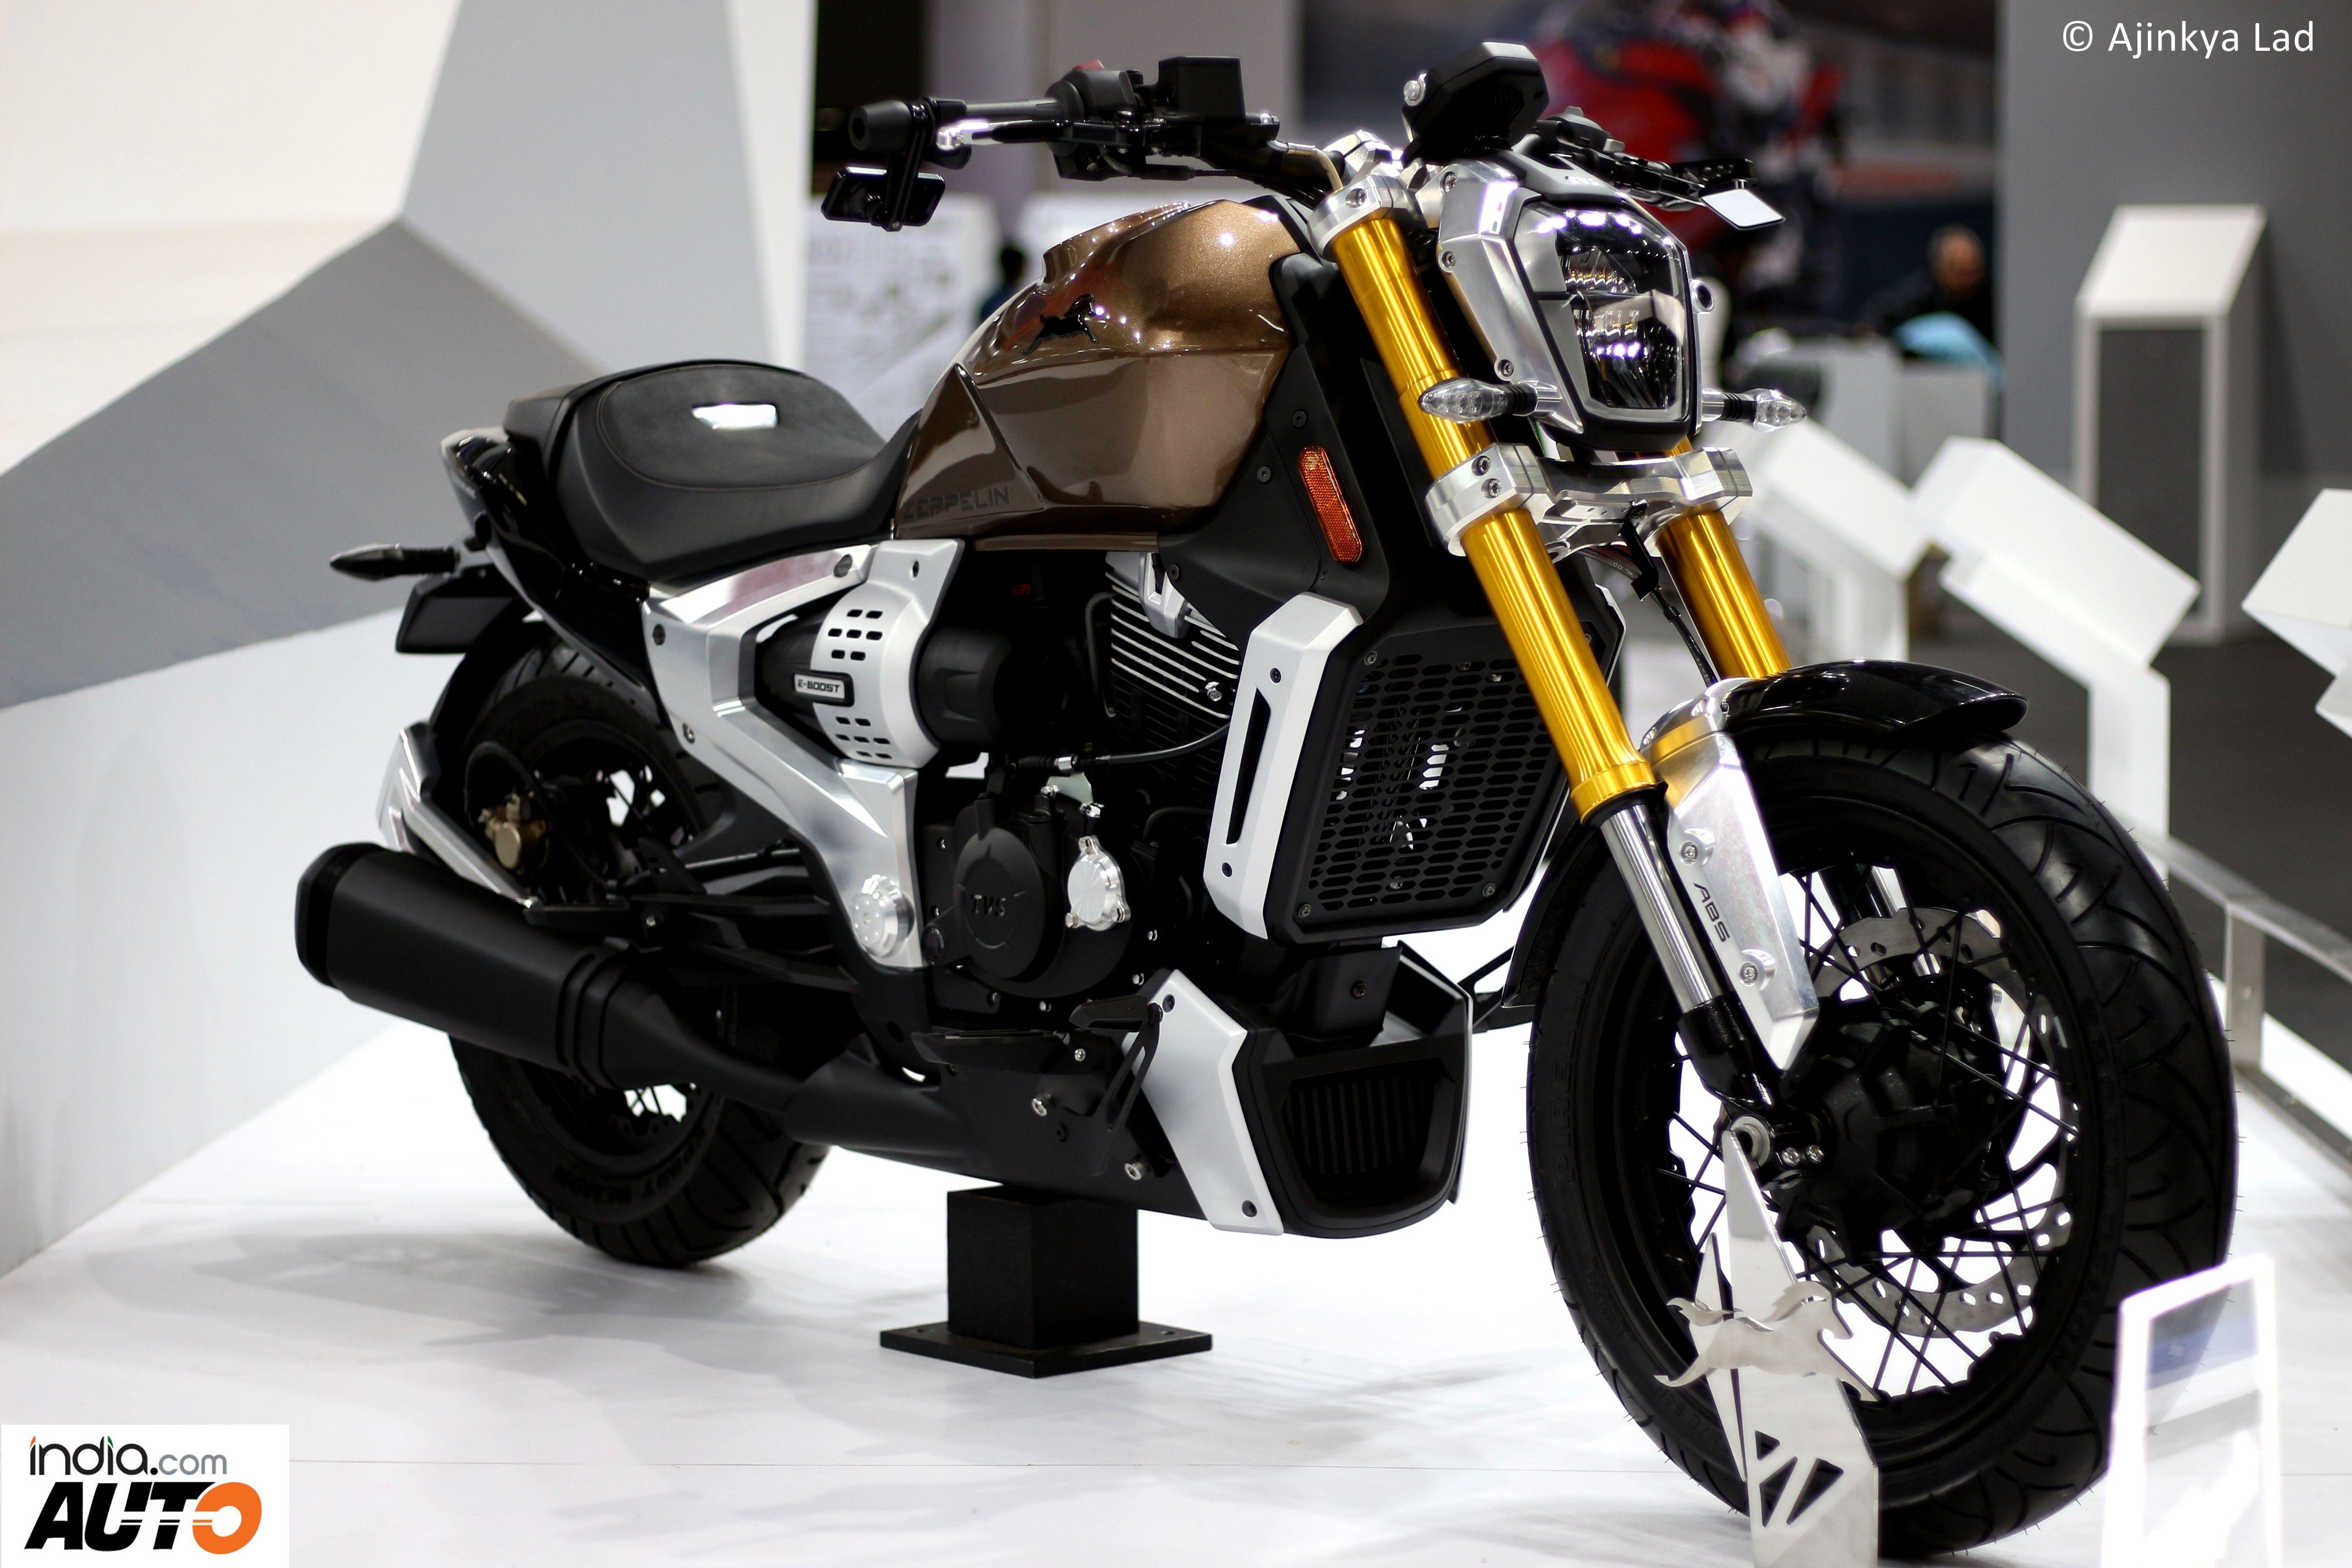 Tvs Motor Company Zeppelin 220 Cruiser 2018 Autosport Bike